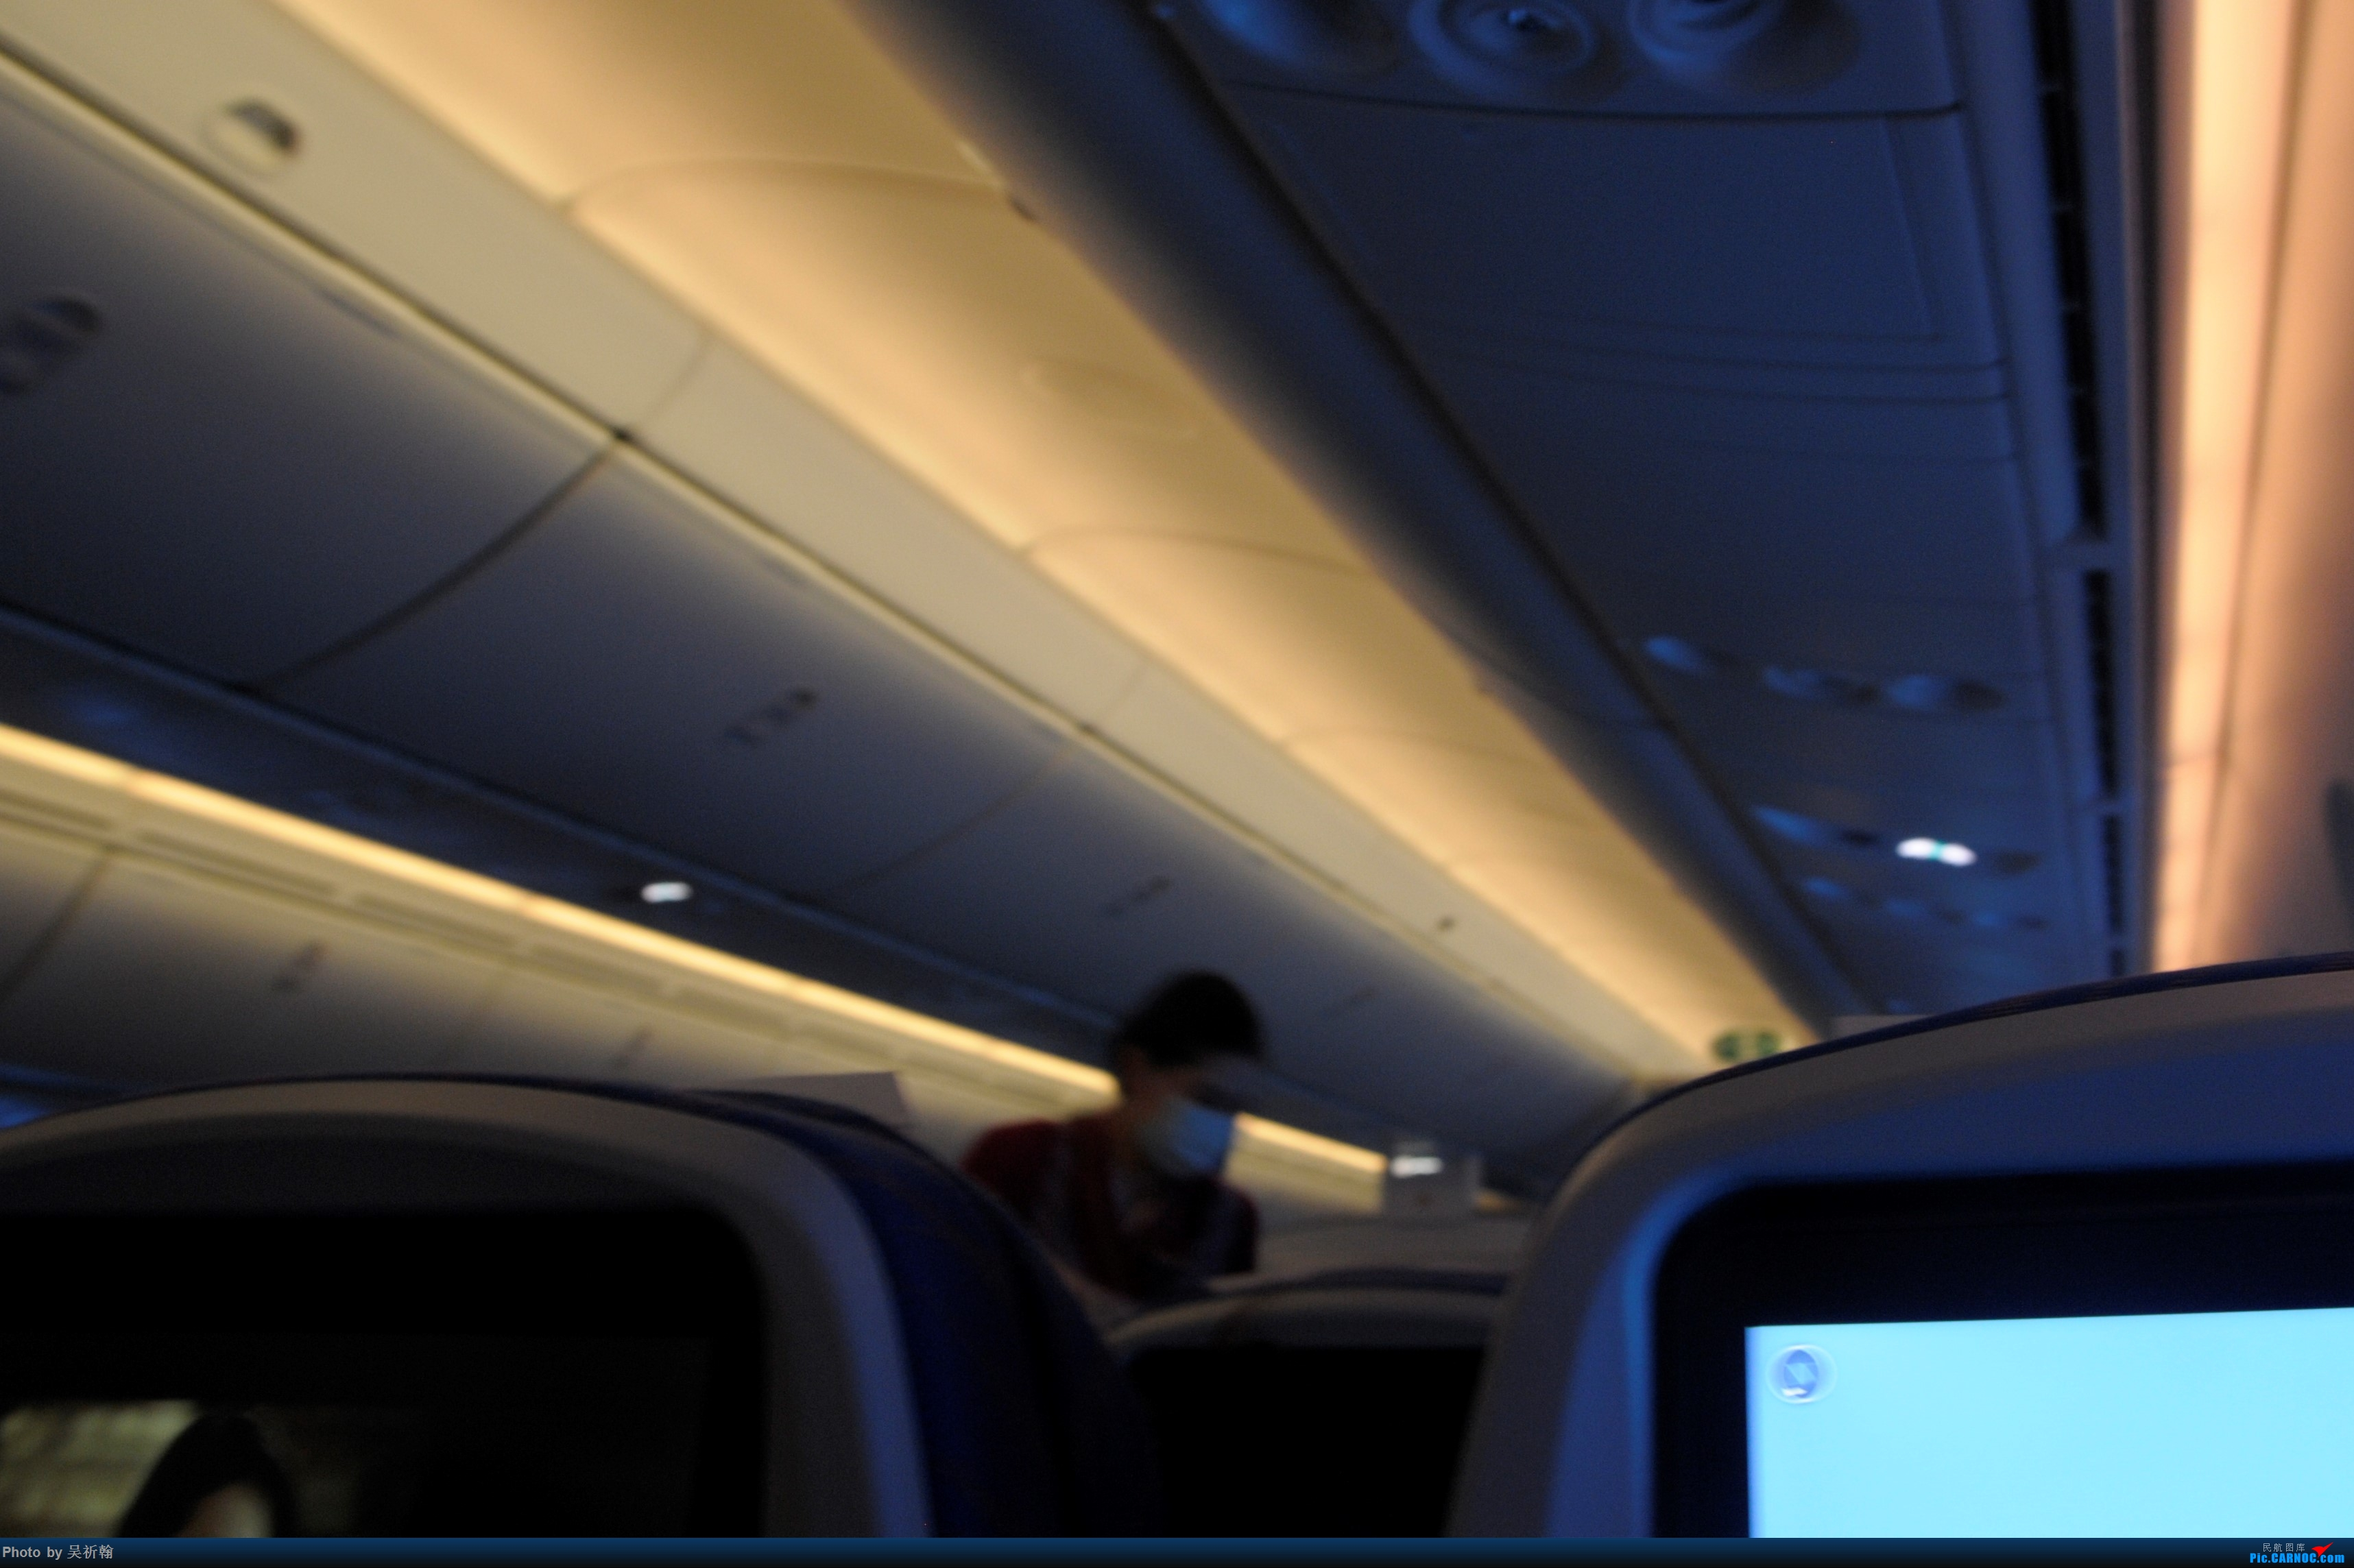 Re:[原创]Kian的飞行游记2:金陵2日游,B787返回广州     空乘